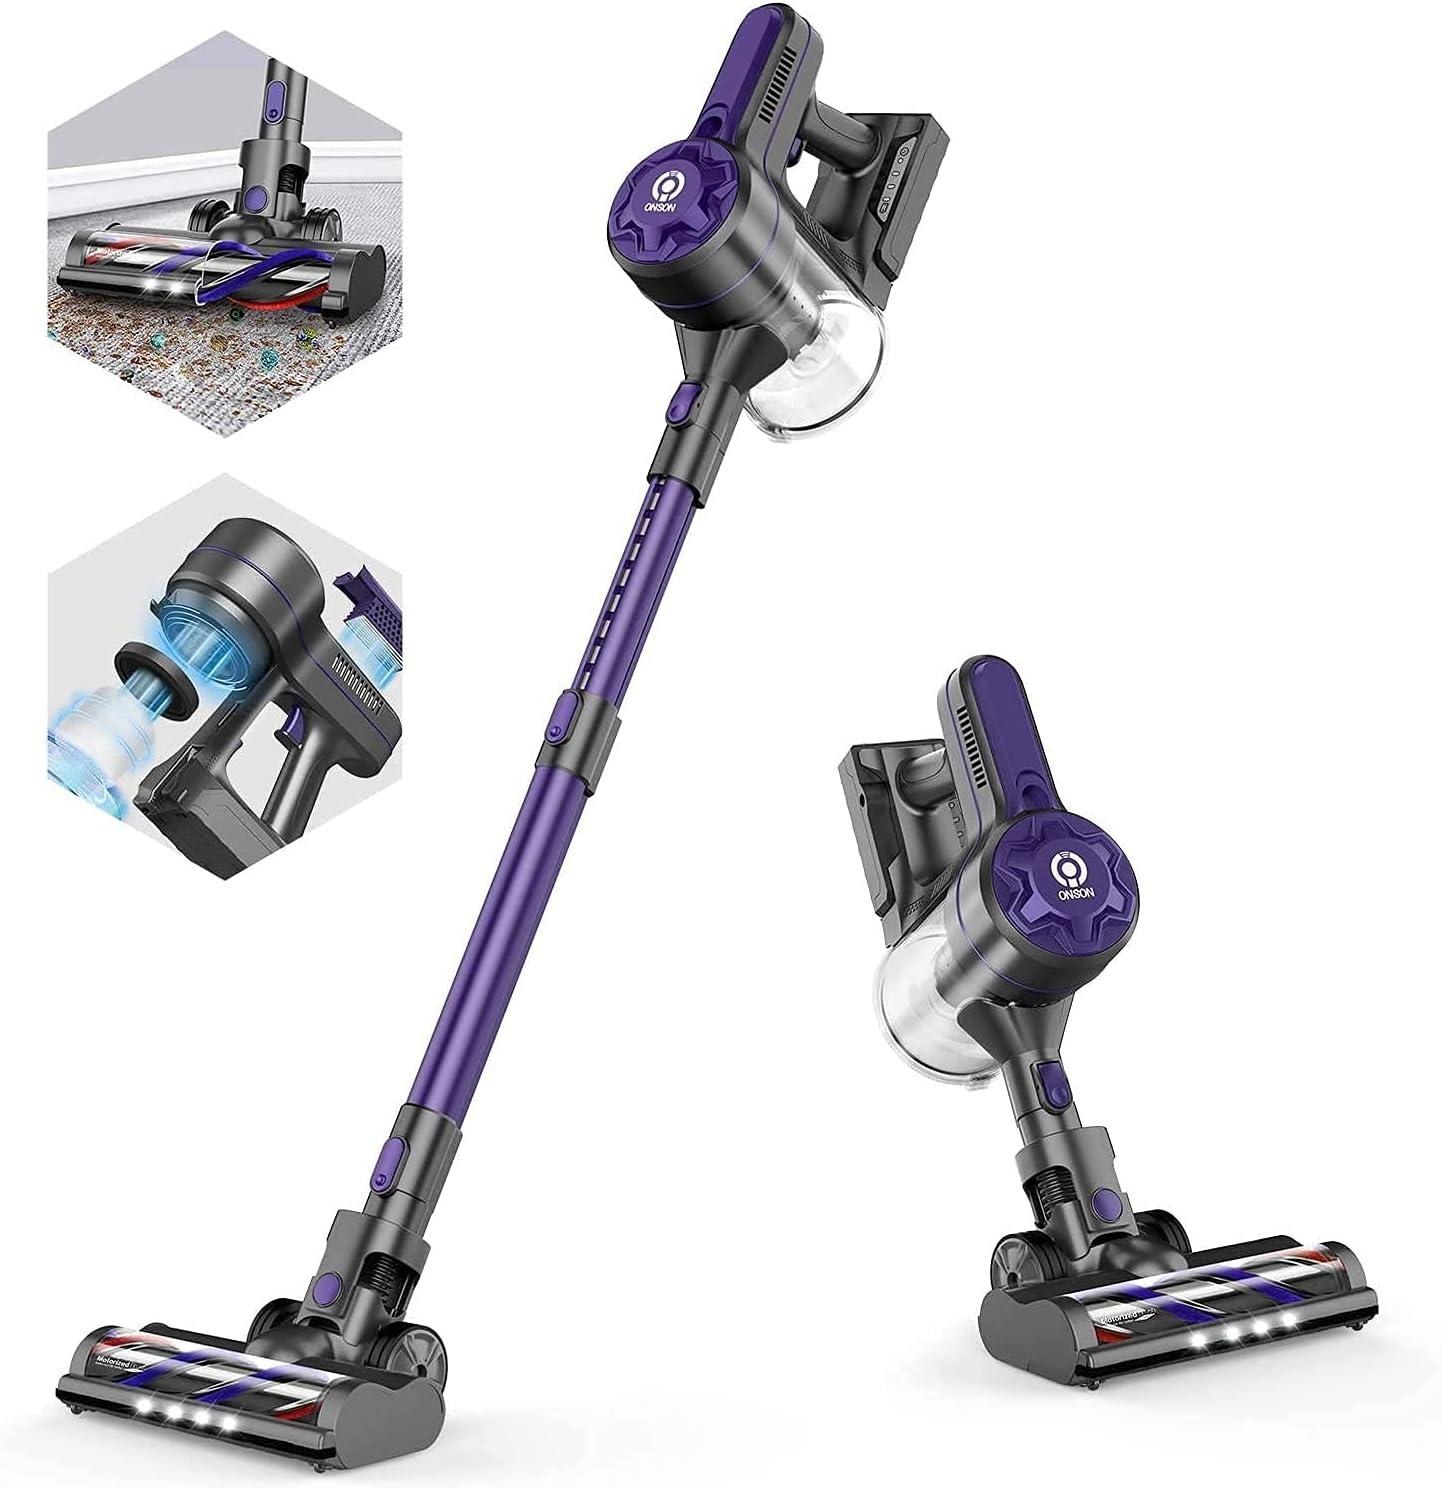 ONSON 20Kpa 80000 RPM Cordless Vacuum Cleaner $129.99 Coupon